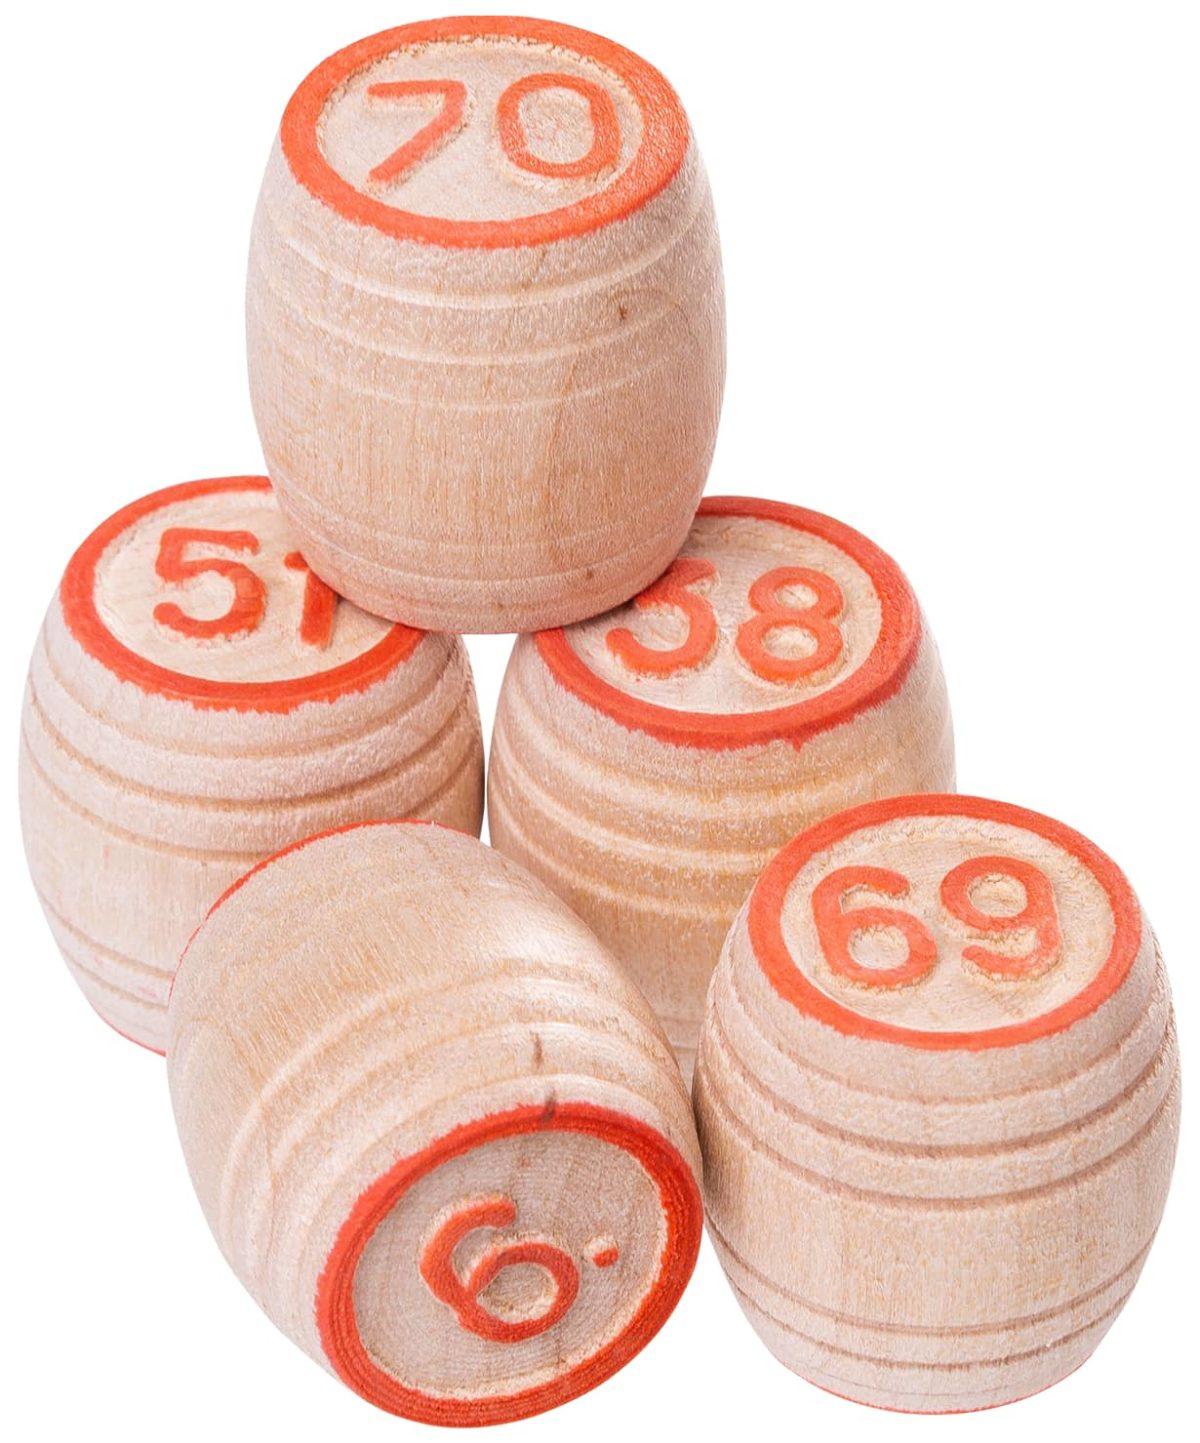 ПРАЙМ СПОРТ Лото бочонок деревянный, деревянная шкатулка  271-18 - 2